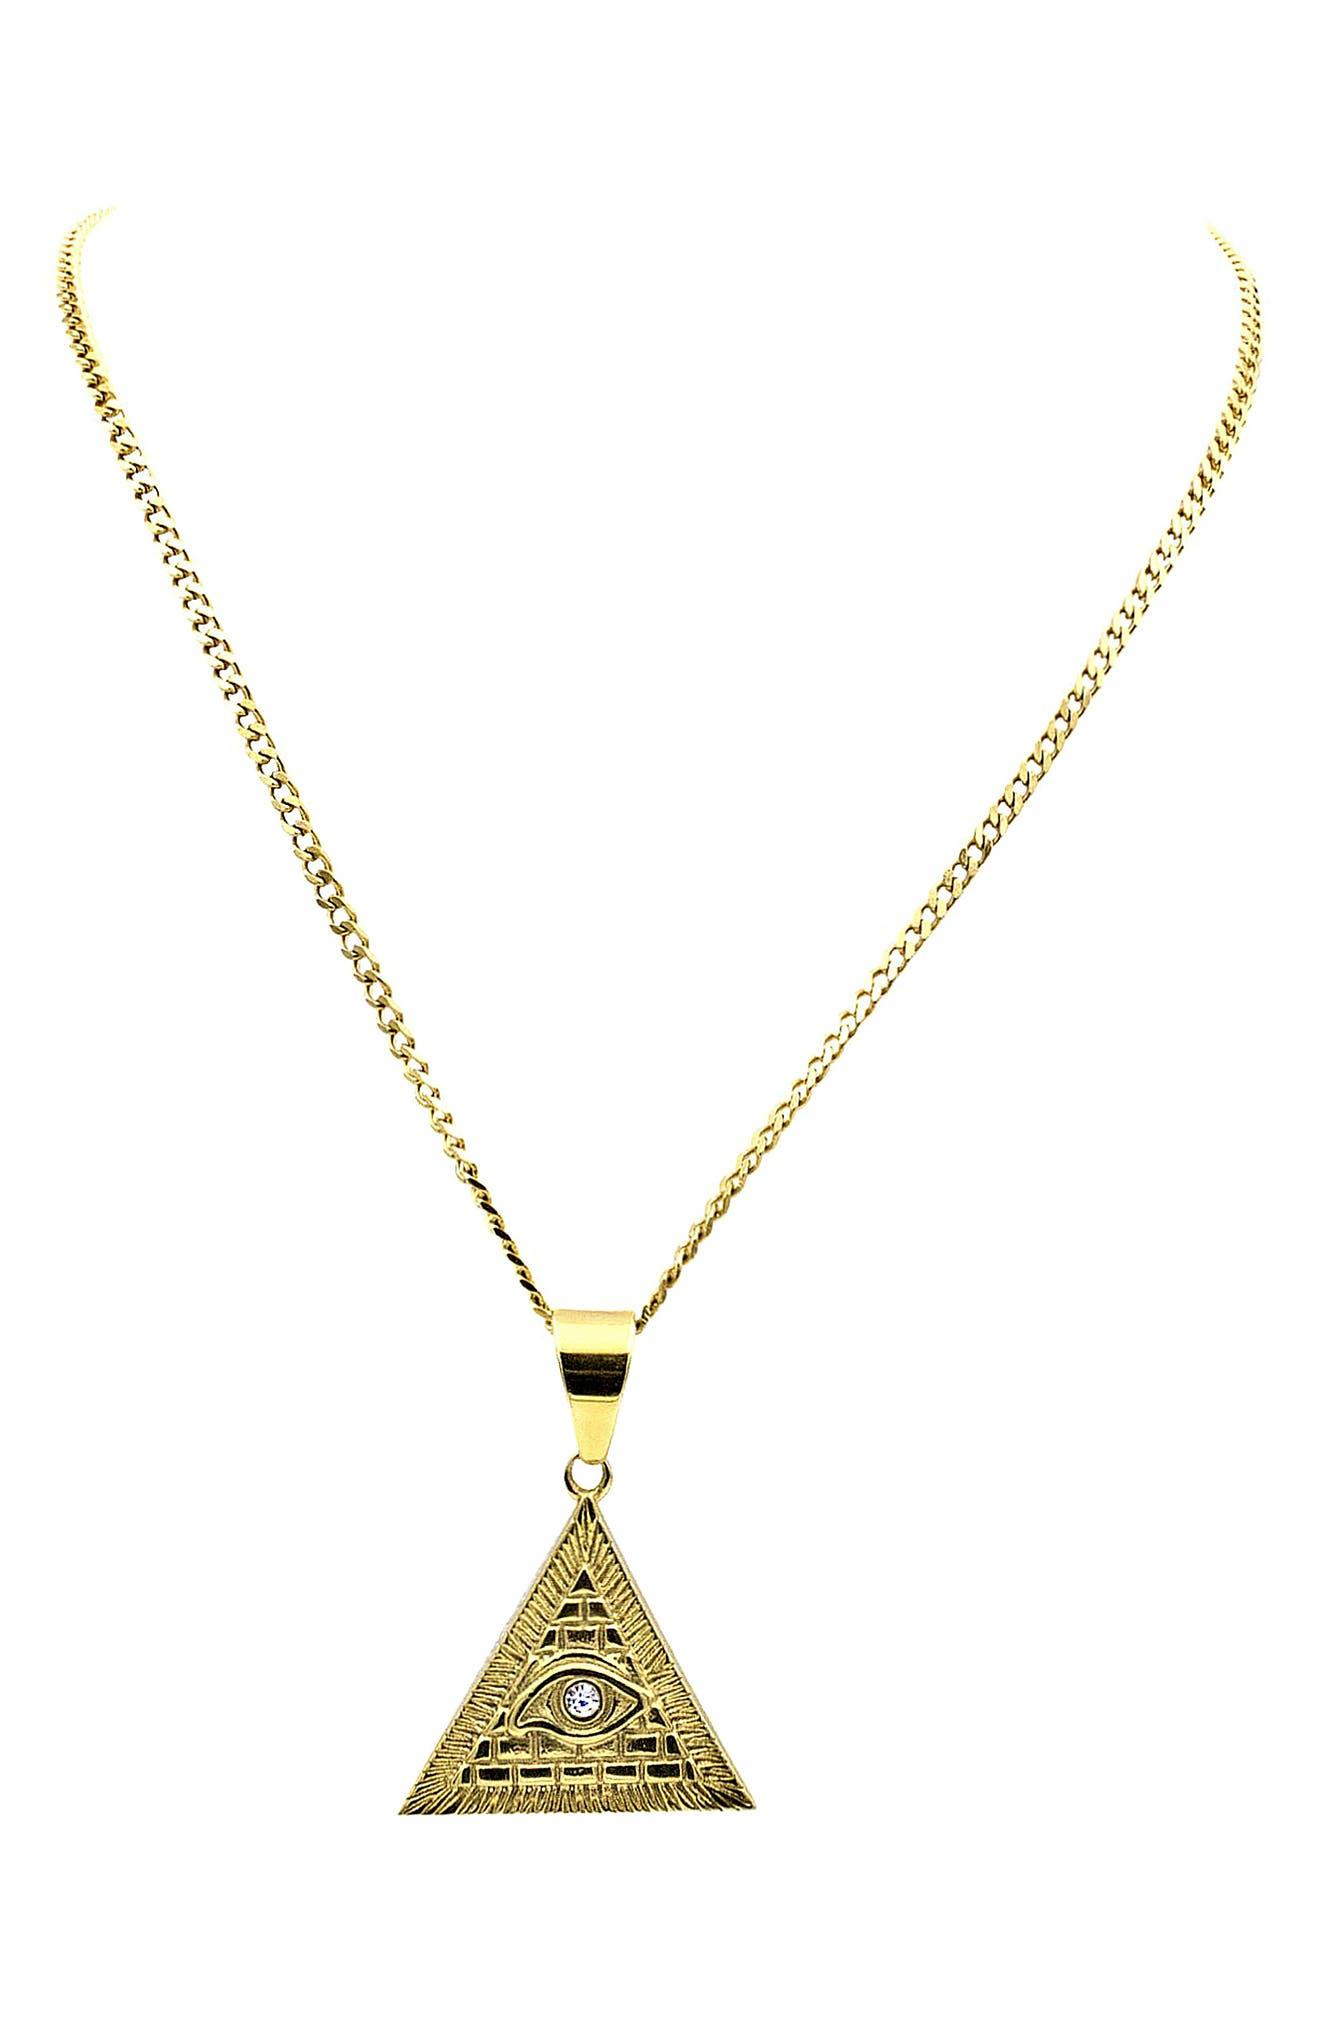 Mara Pendant Necklace,                         Main,                         color, Gold